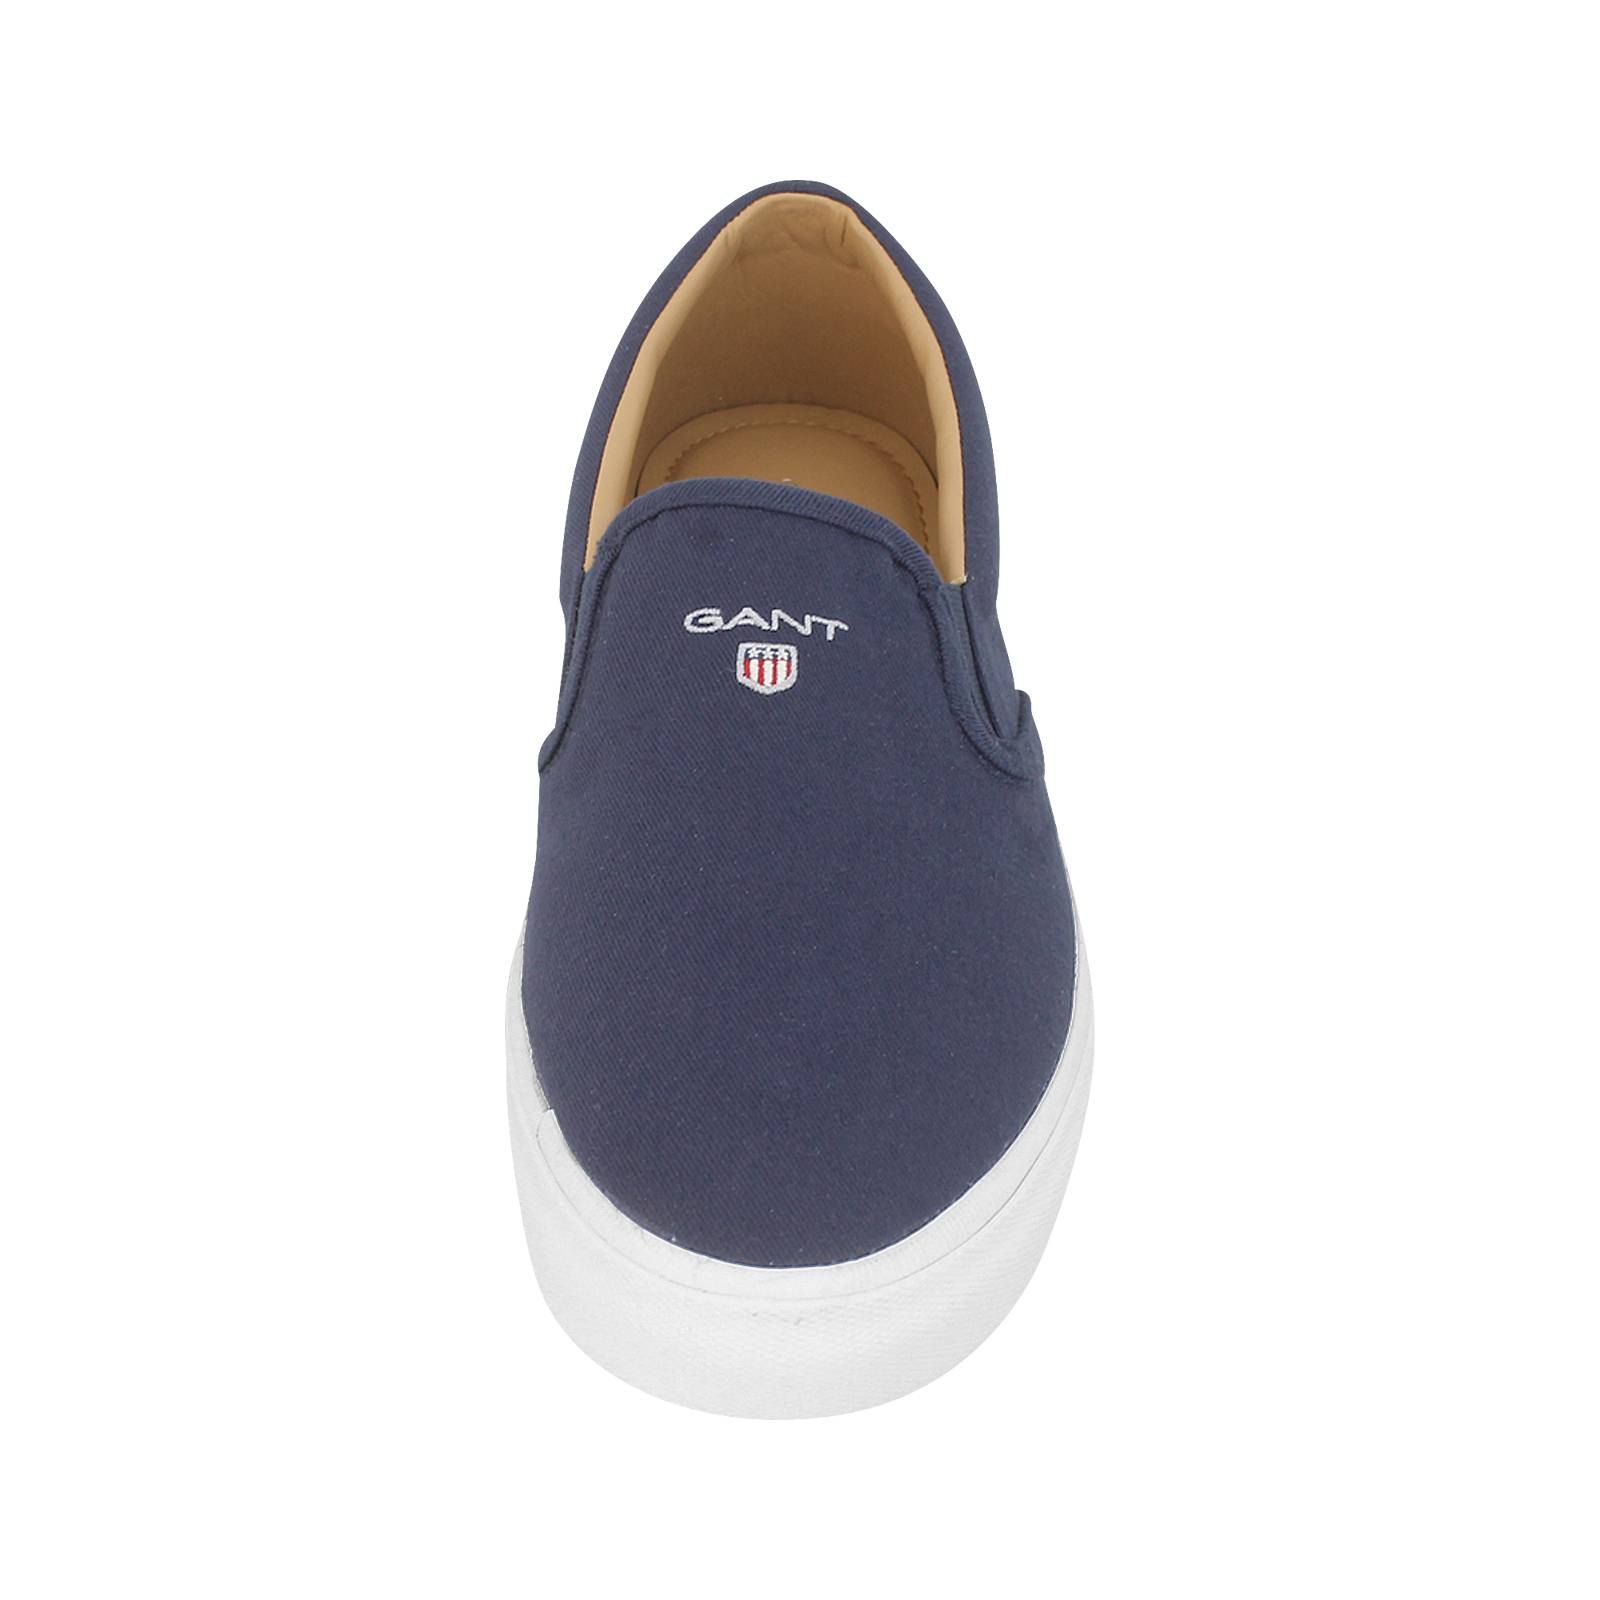 b82a63788ebf Hero Slip-On - Ανδρικά παπούτσια casual Gant από υφασμα - Gianna ...